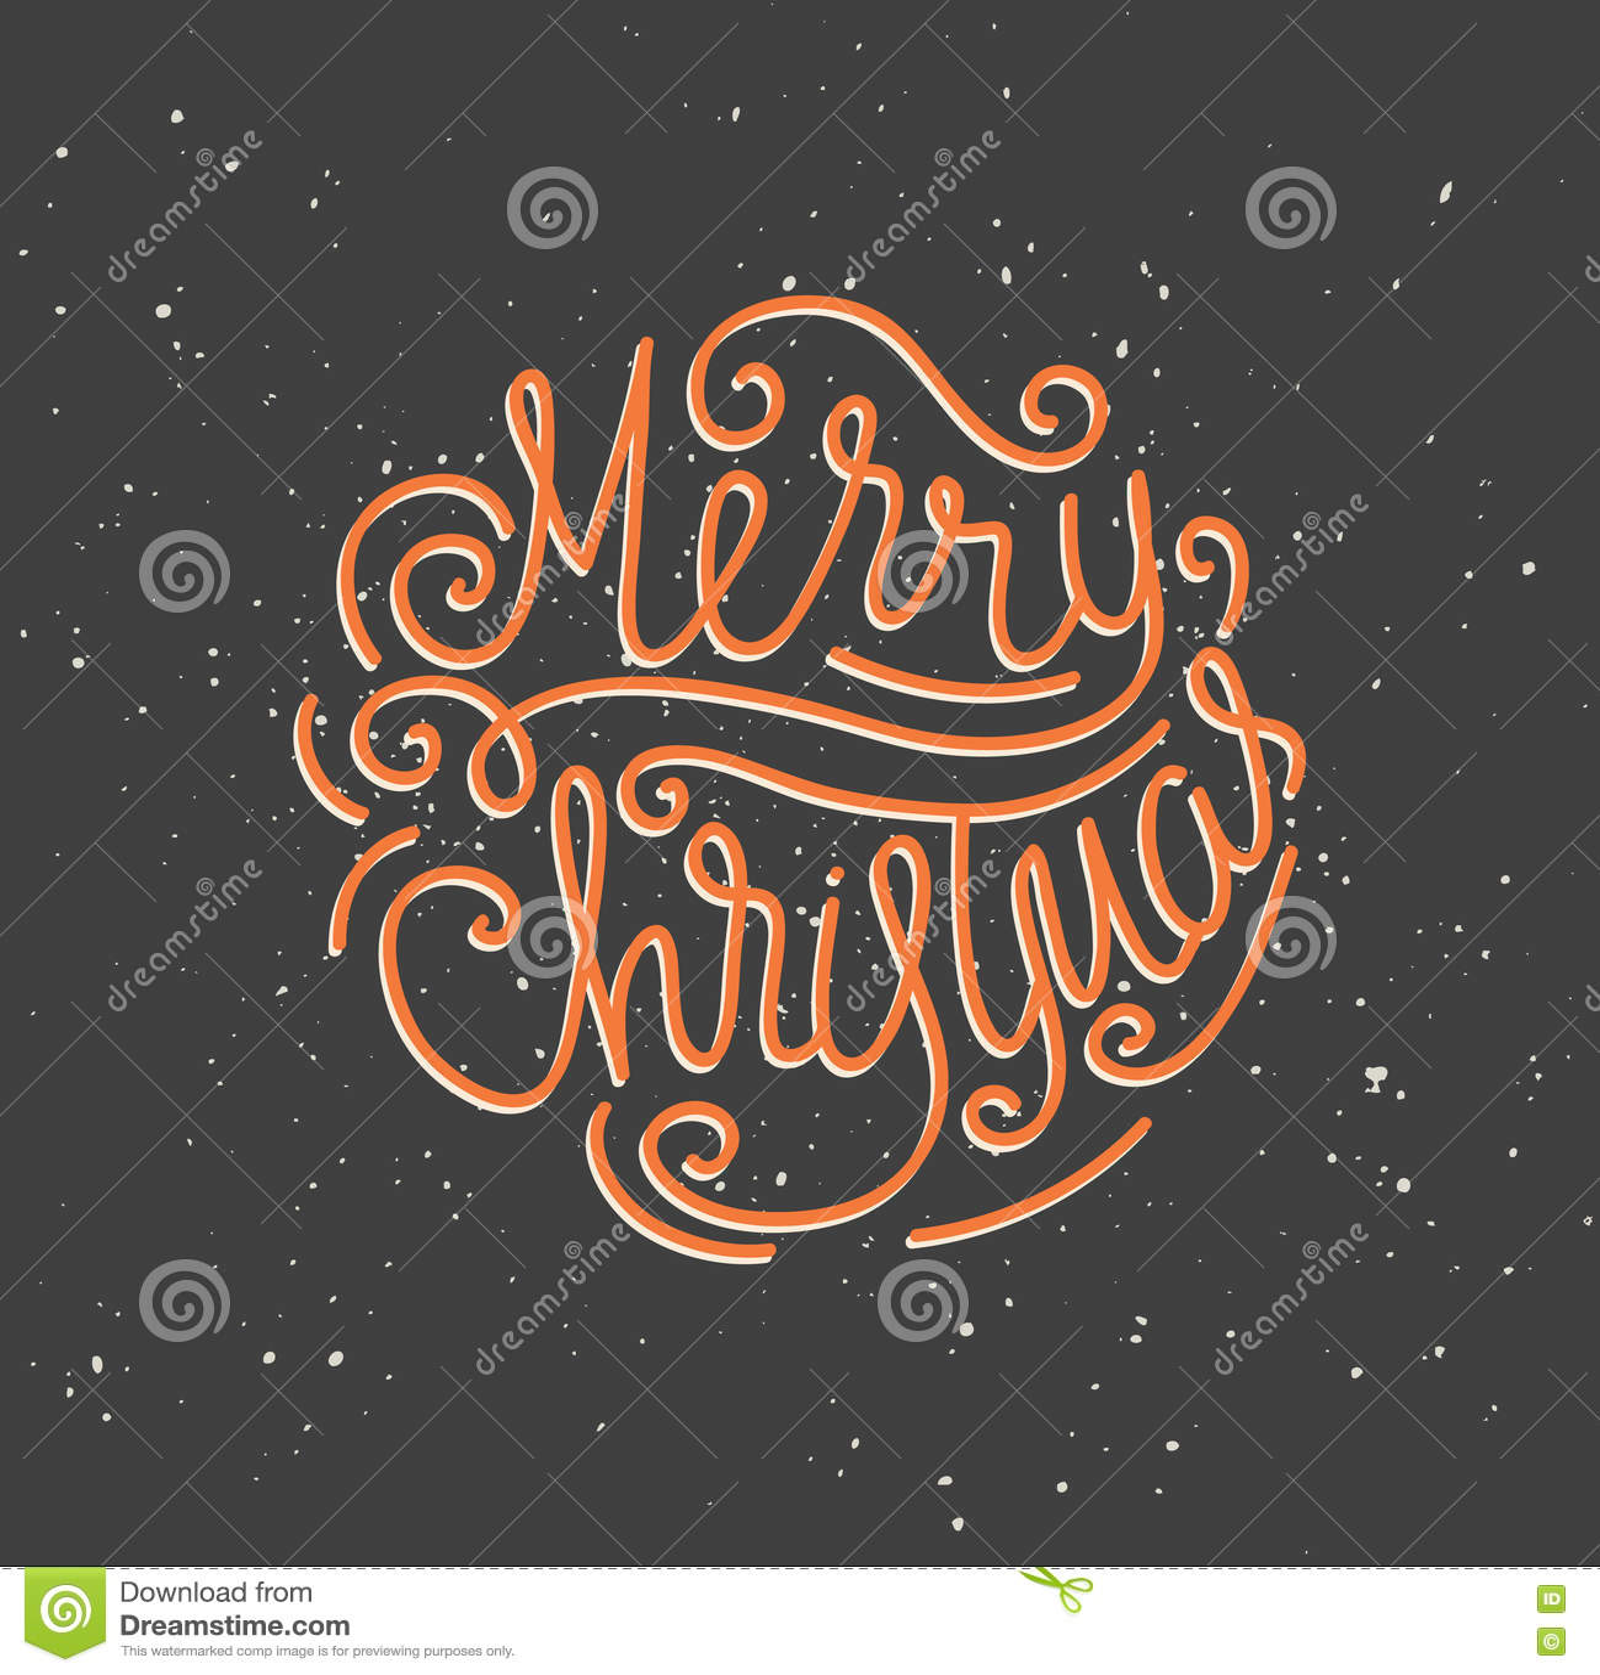 merry christmas greeting card season vector holiday poster season vector holiday poster template